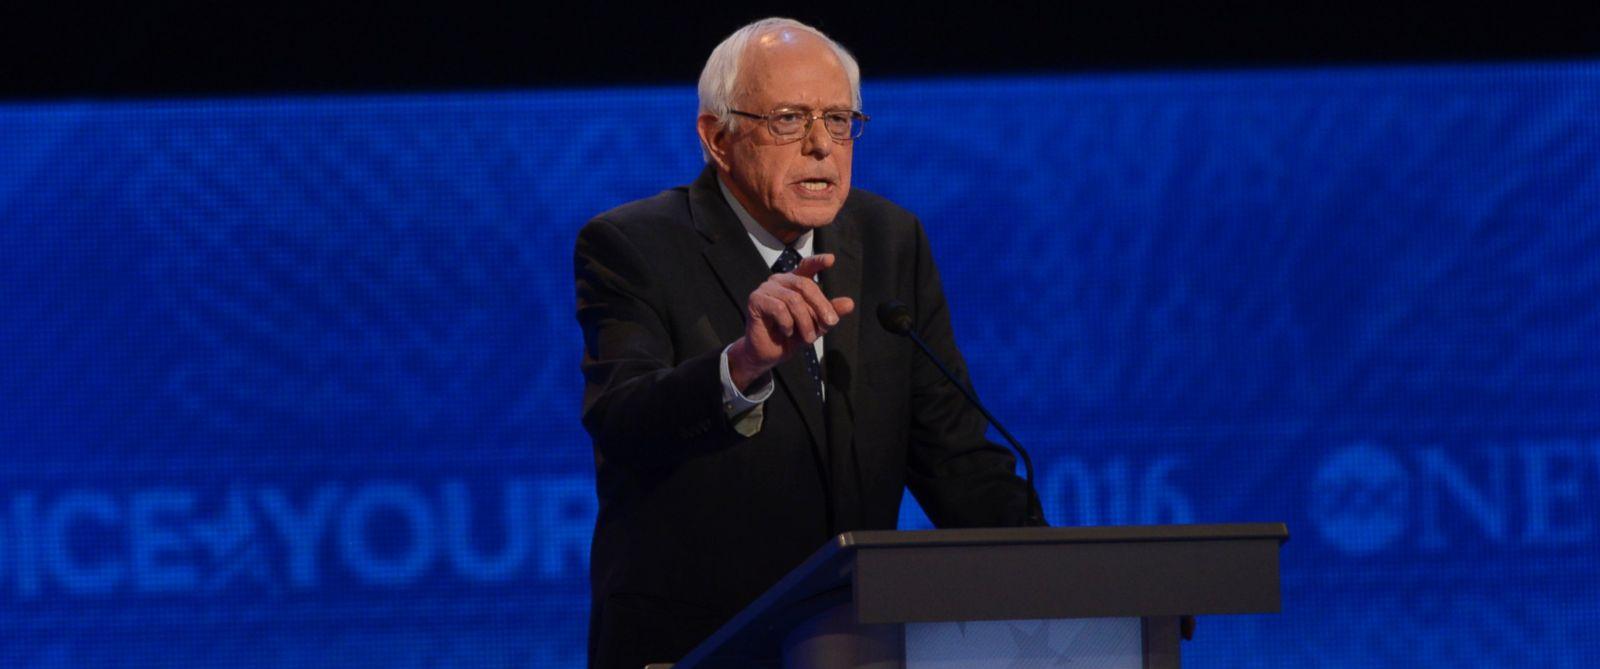 PHOTO: Sen. Bernie Sanders spoke at the Democratic Presidential debate at St. Anselm College in Manchester, NH.